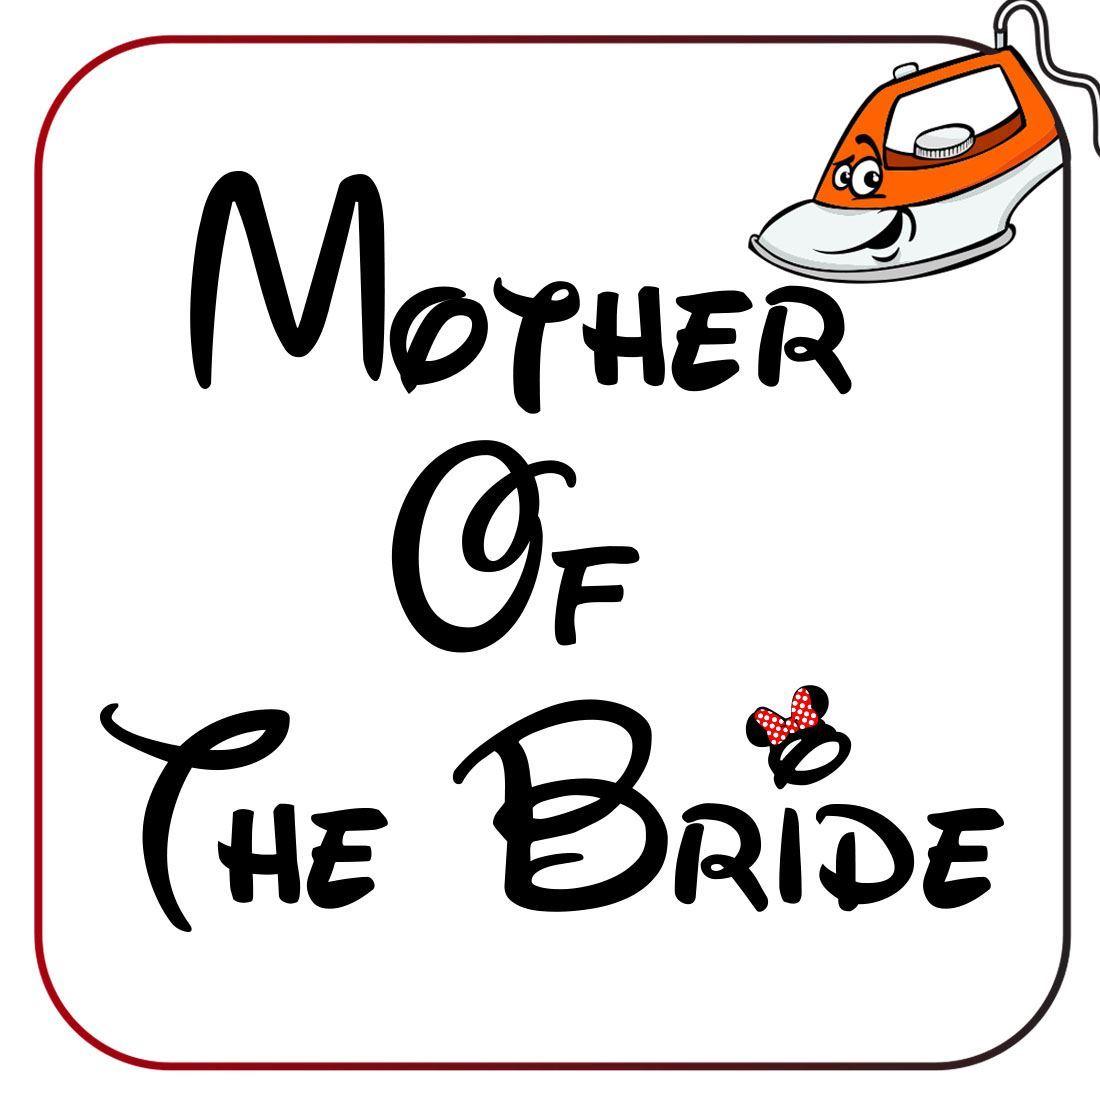 Brides Squad Iron on TShirt Transfer Flower Girl Hen Do Crew Bride Tribe SPARKLE